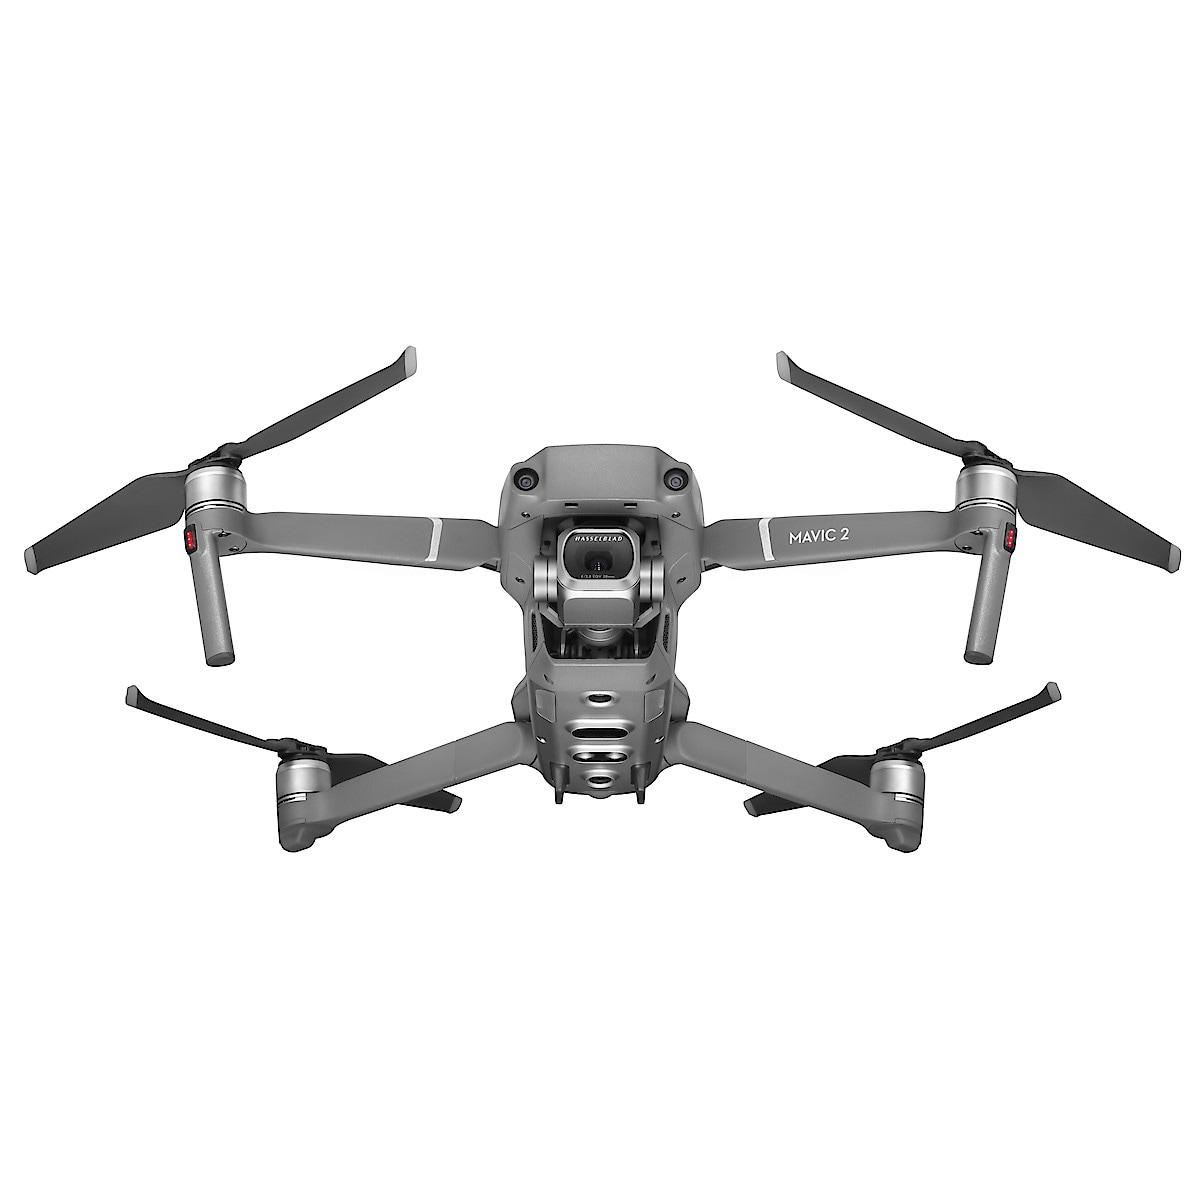 DJI Mavic 2 Pro, drone